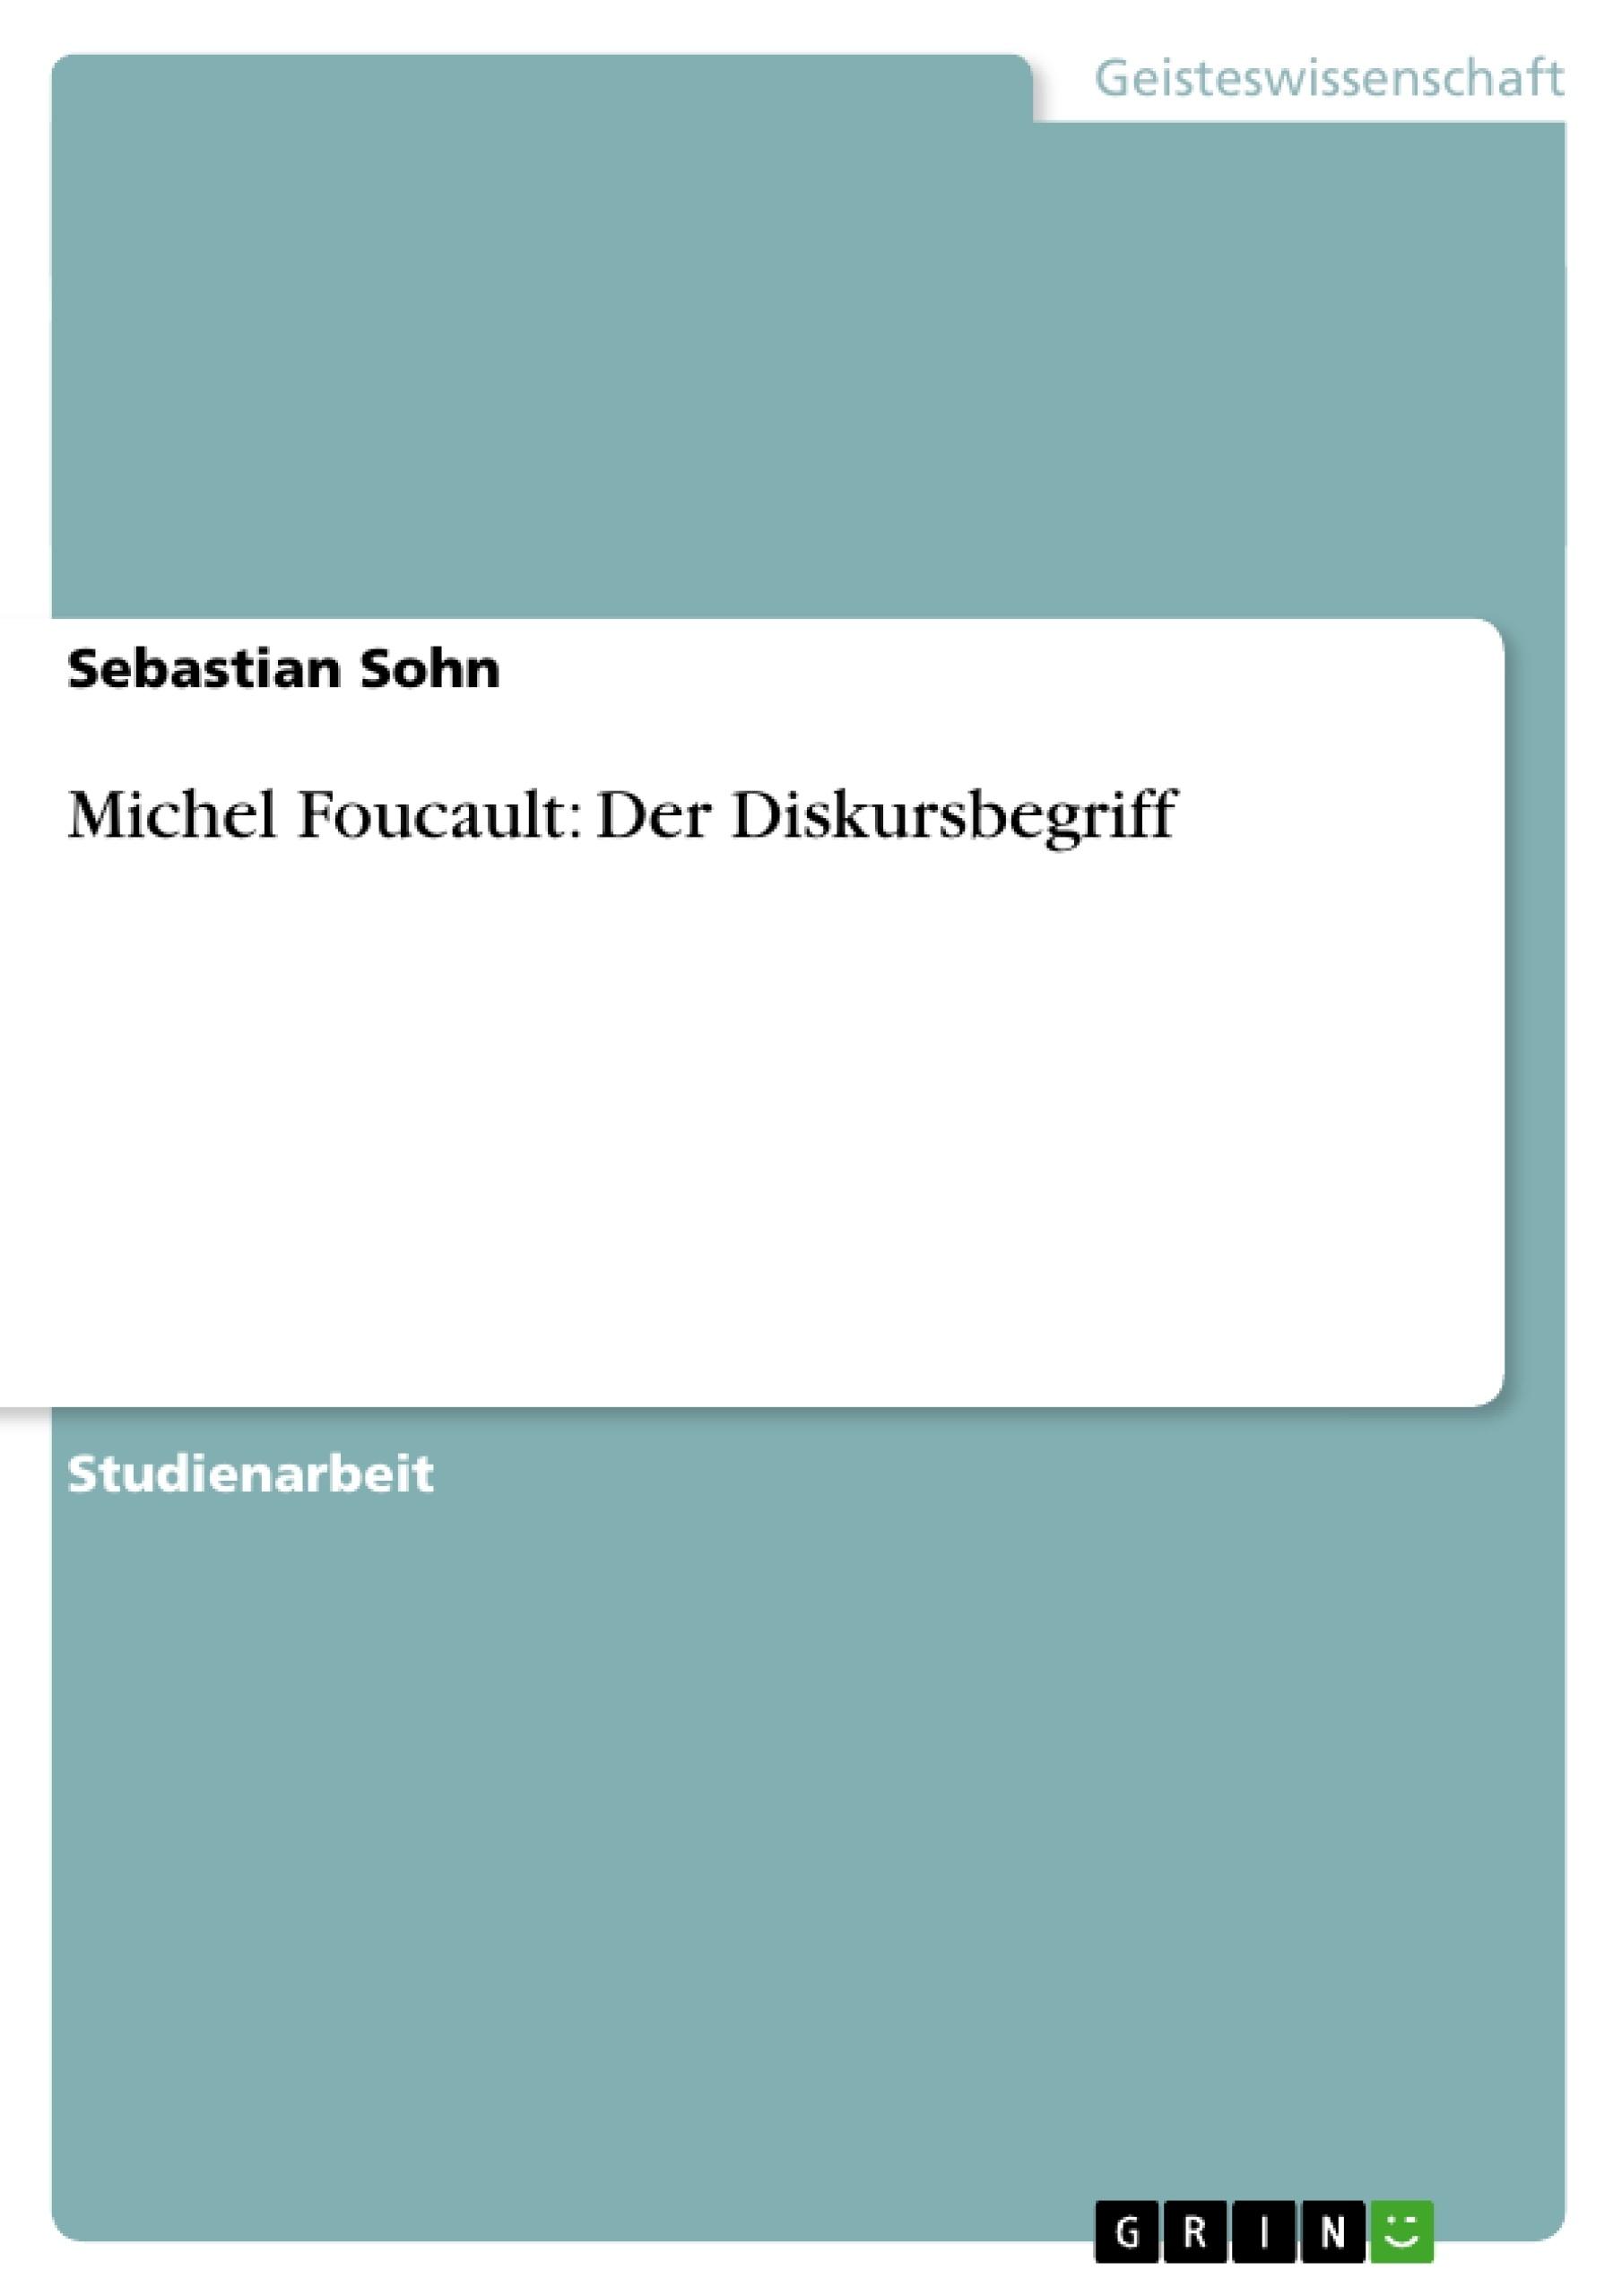 Titel: Michel Foucault: Der Diskursbegriff